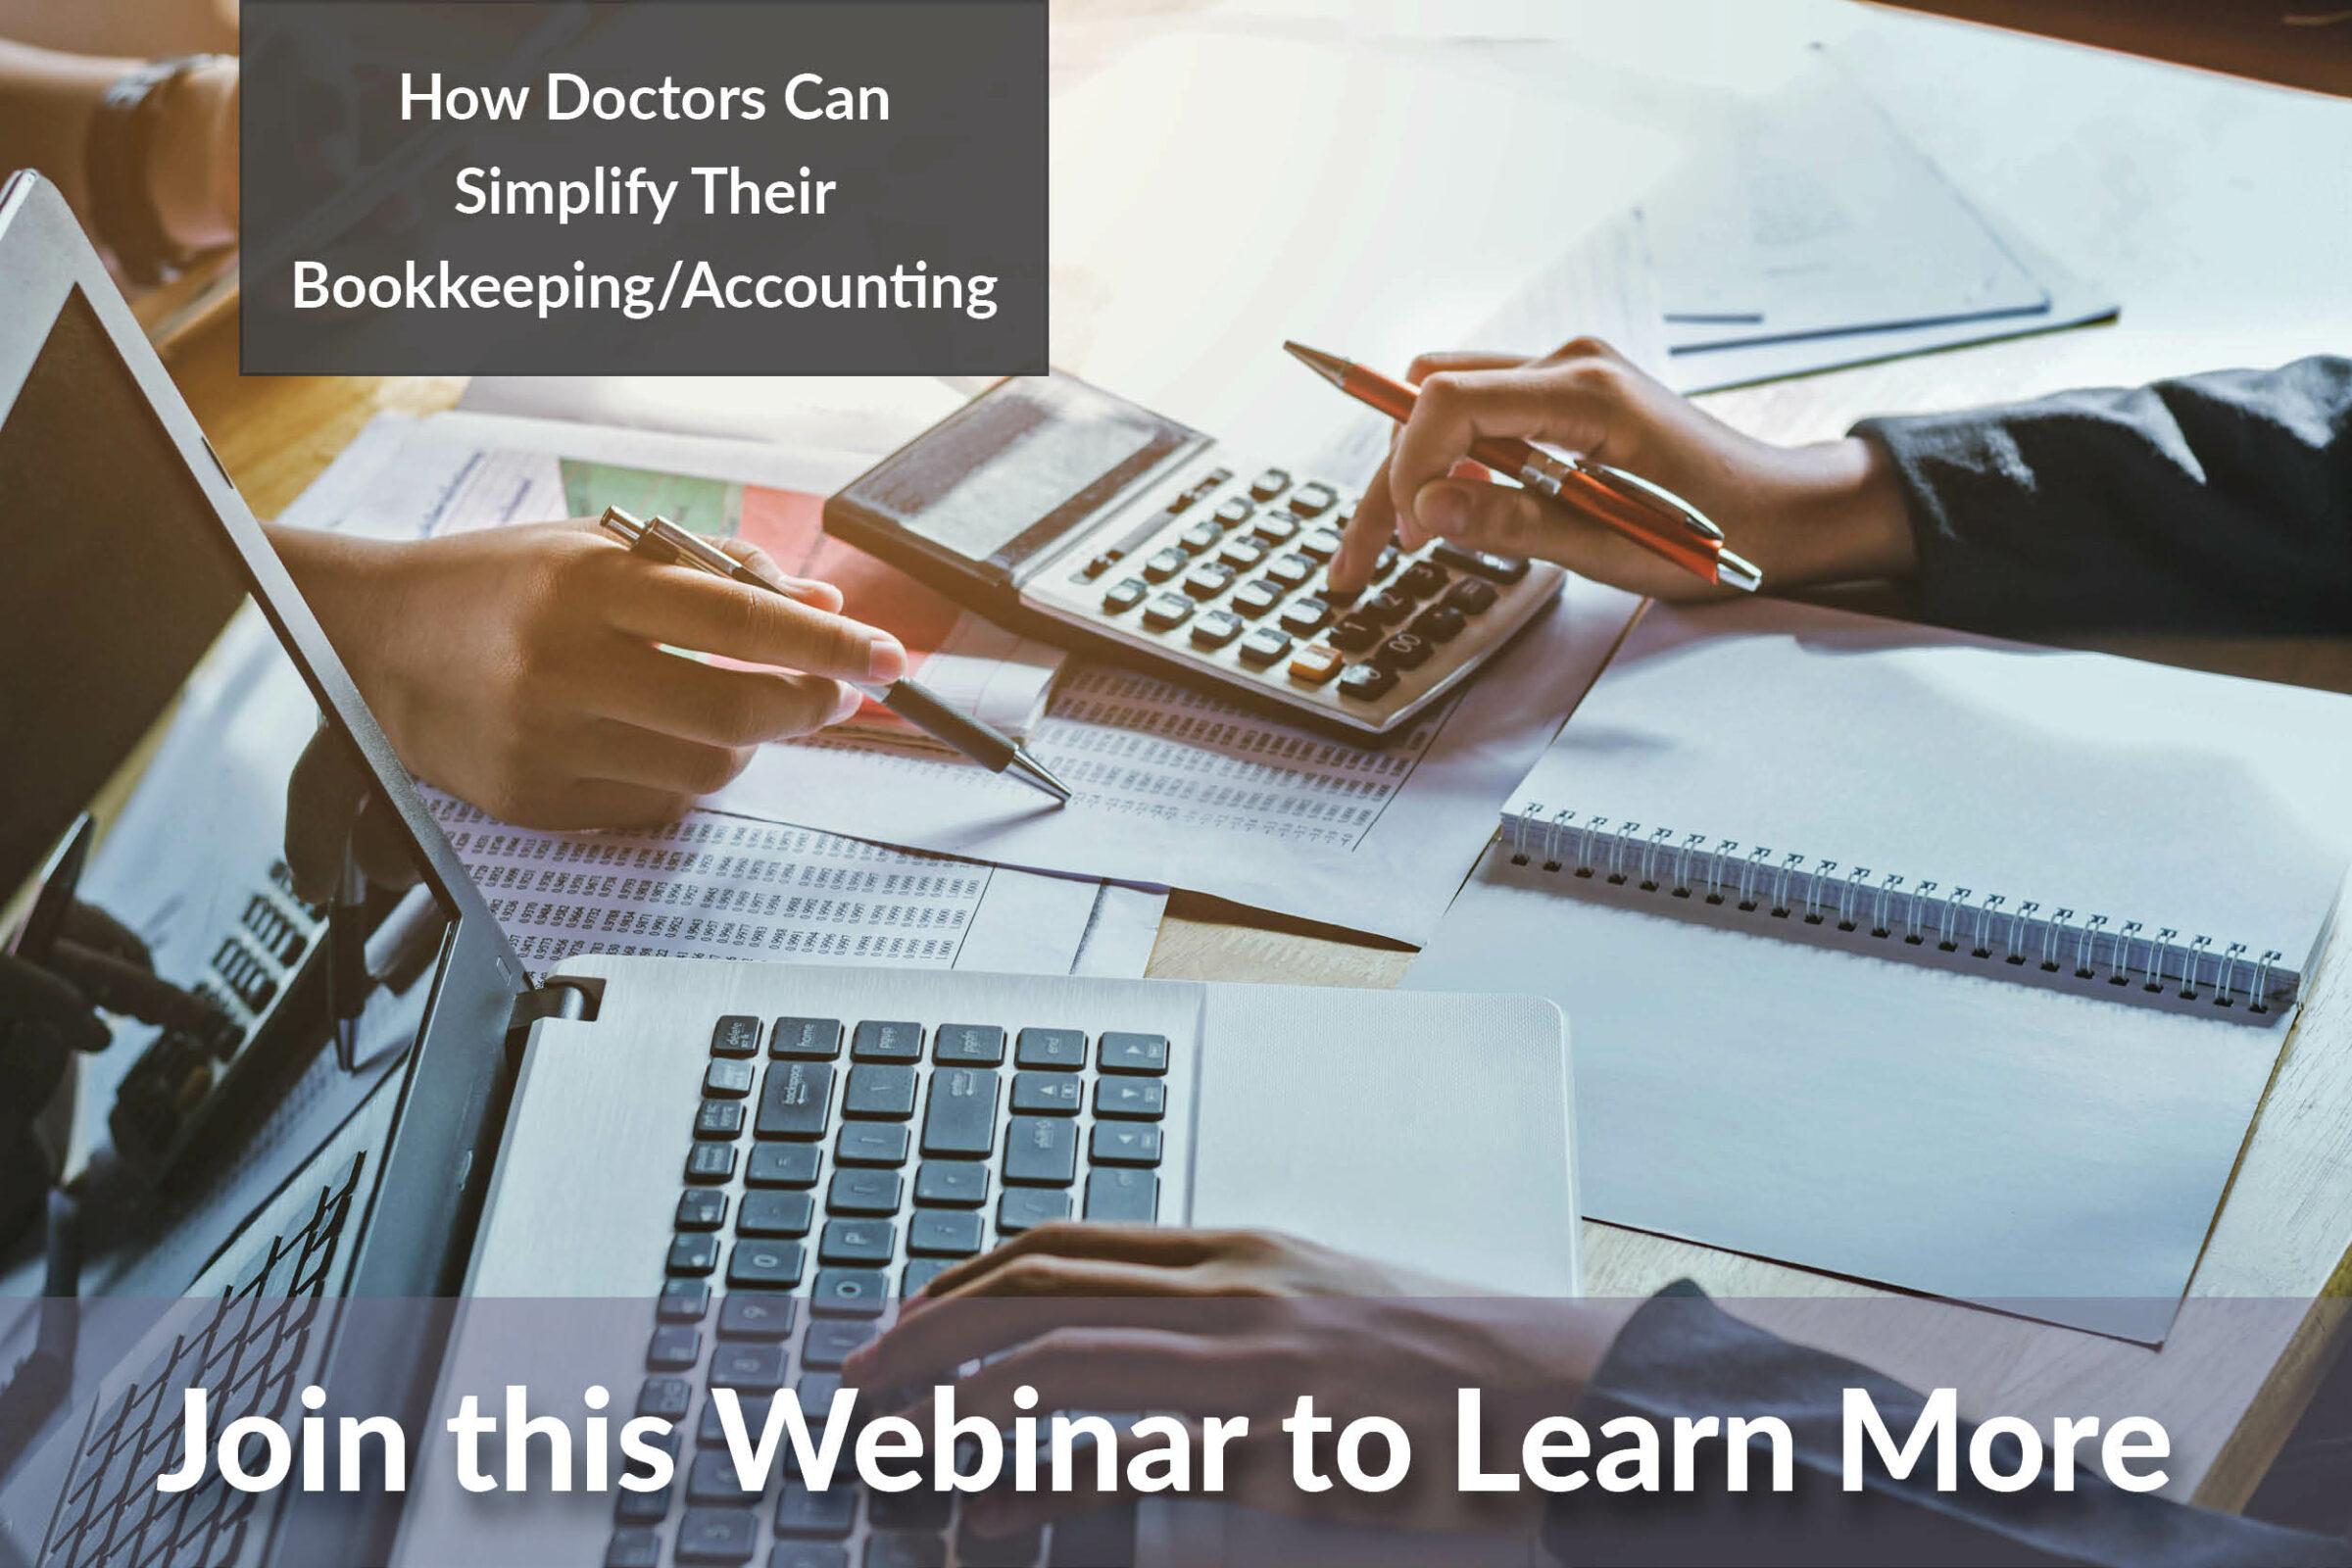 PECAA Webinar - Accounting for Doctors